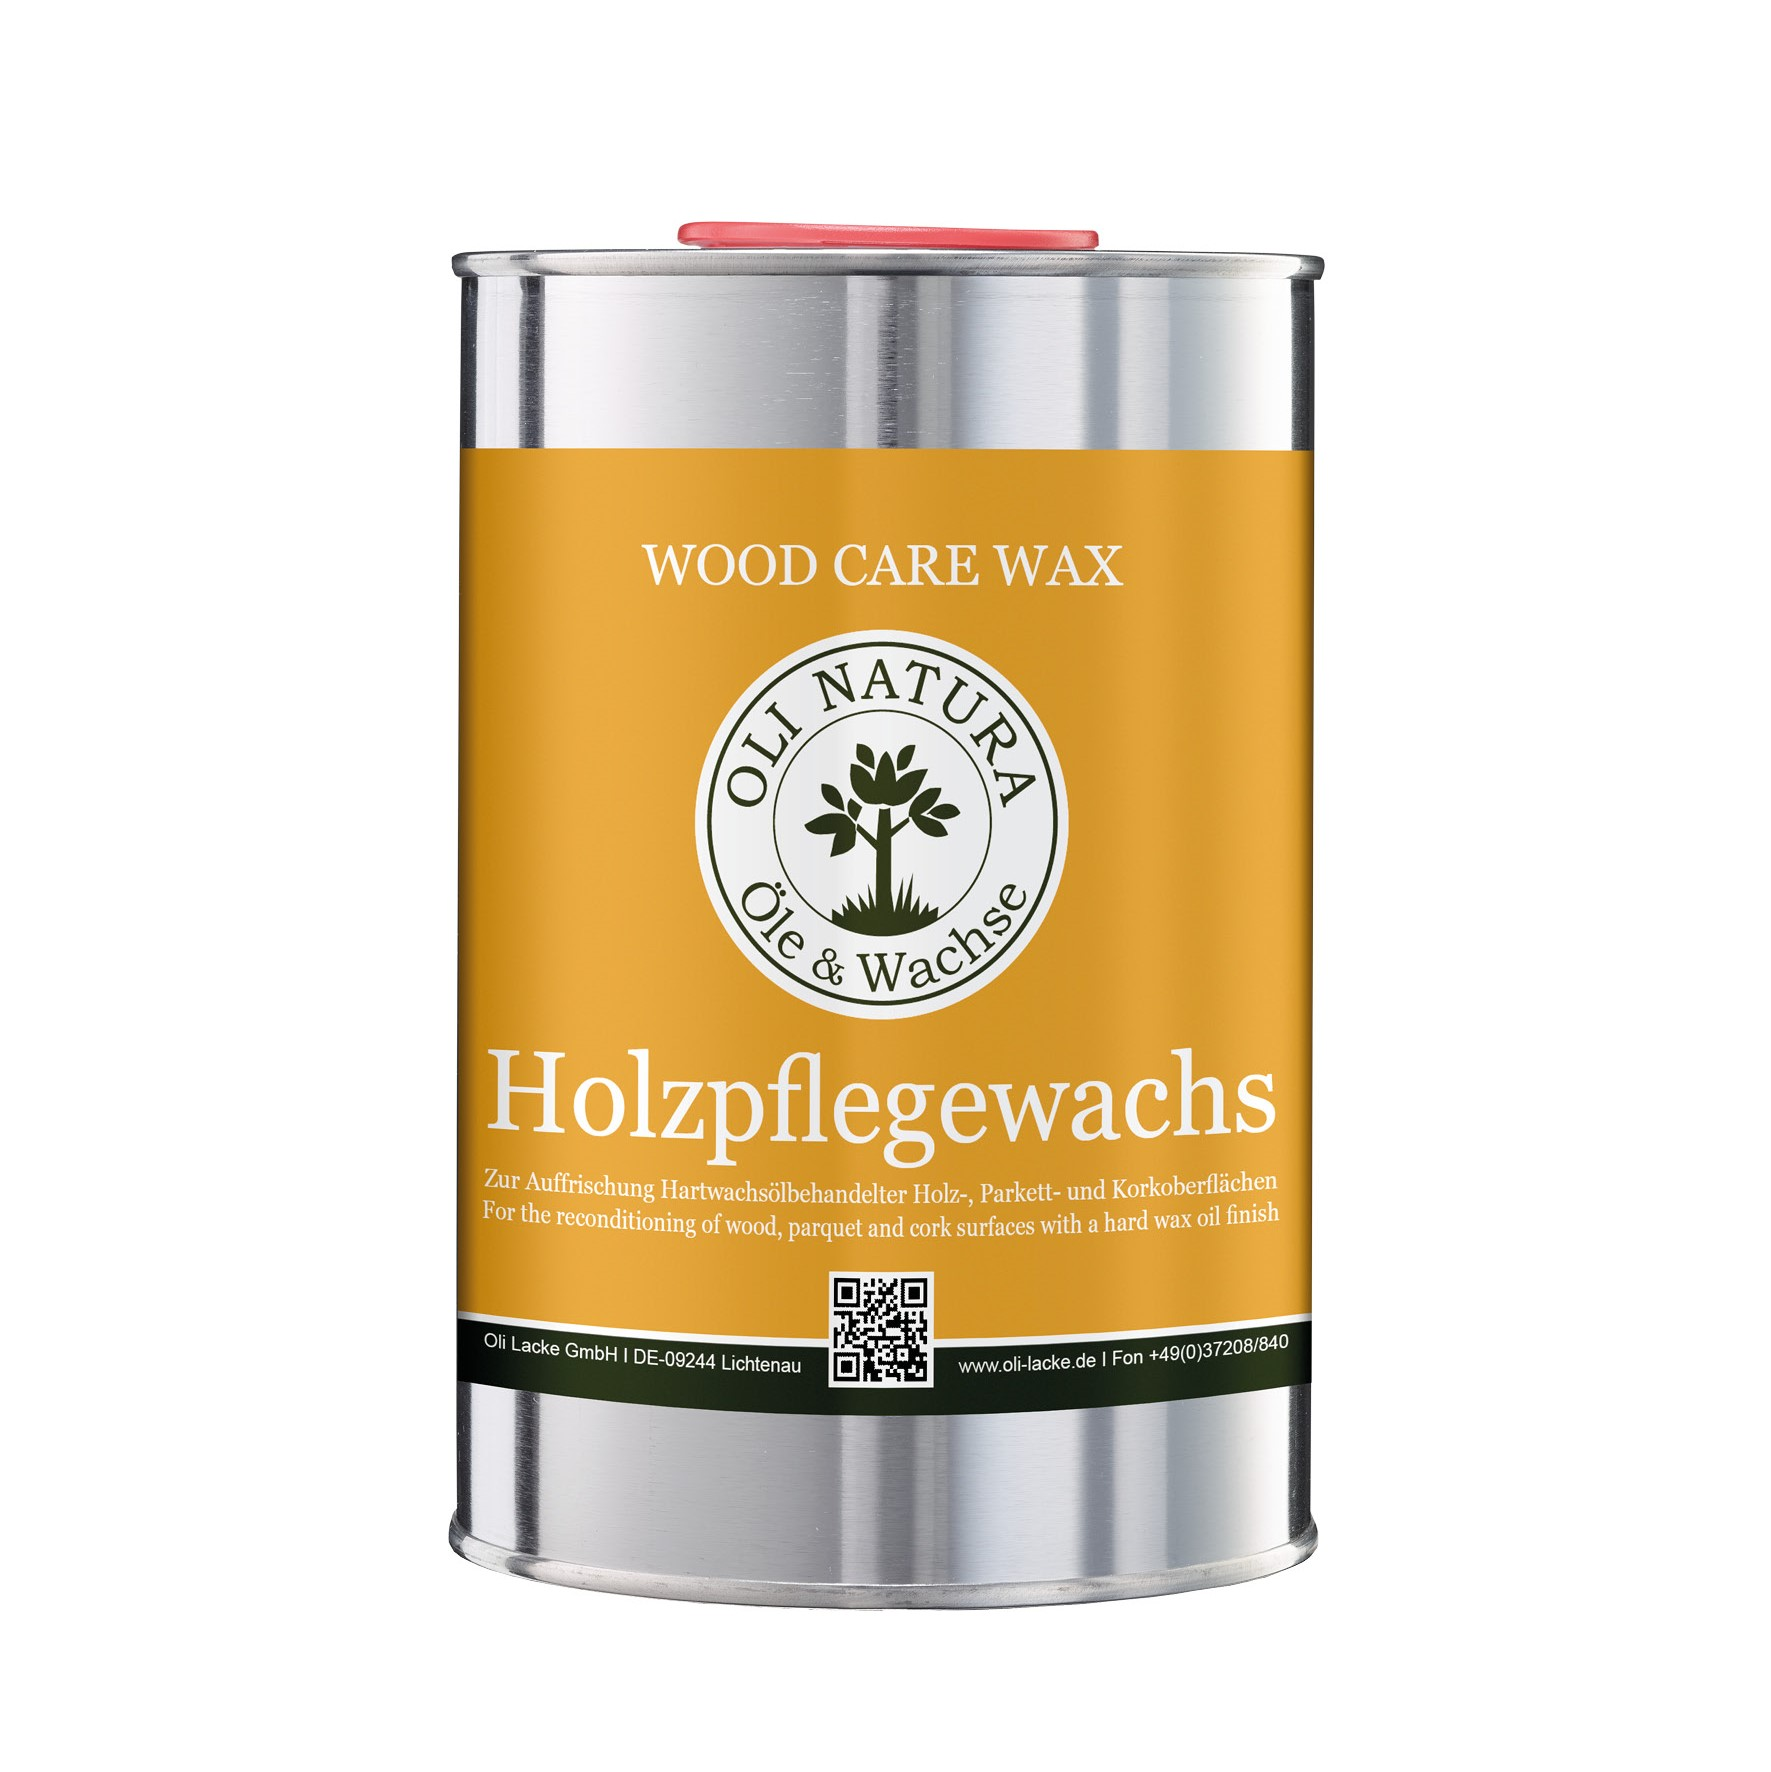 Holzpflegewachs - OLI Lacke GmbH